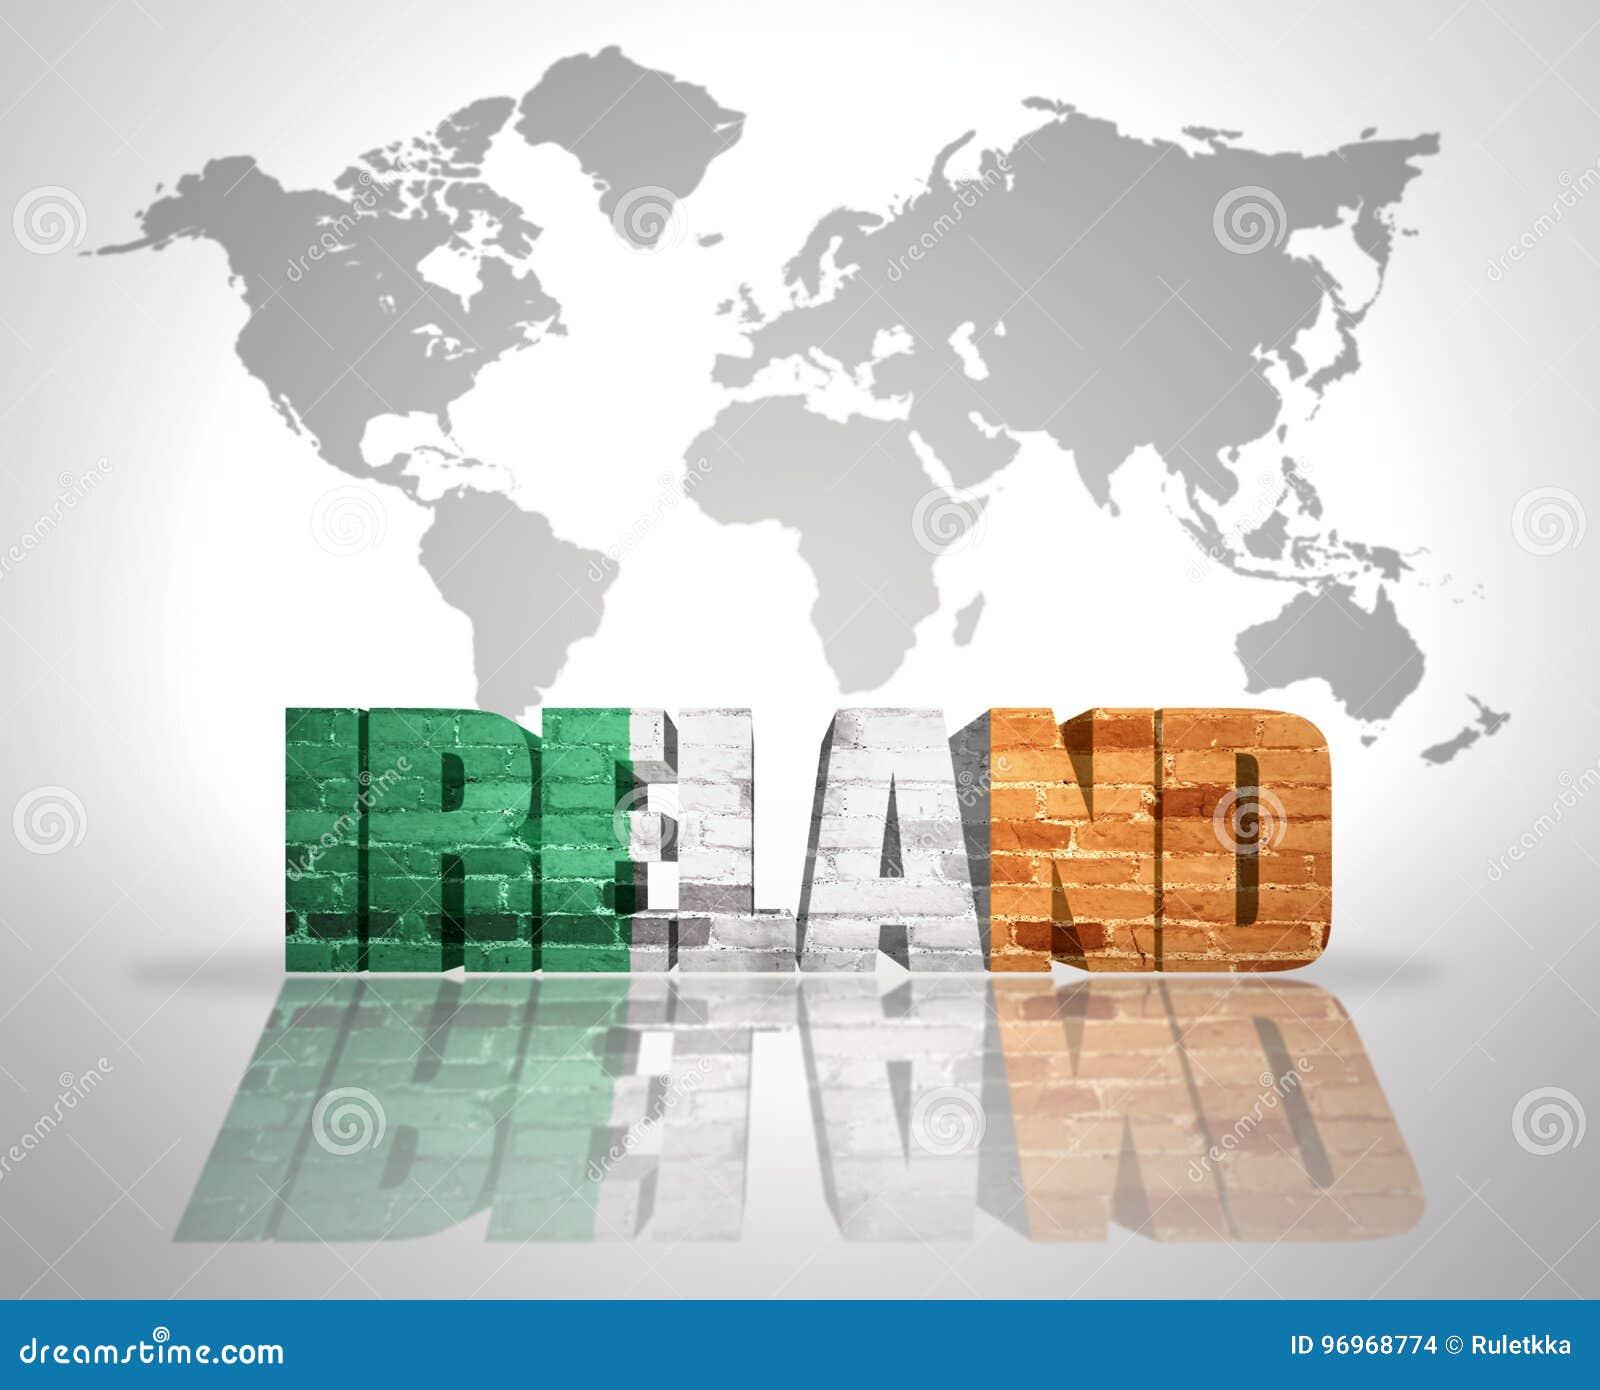 Word Ireland On A World Map Background Stock Illustration ...